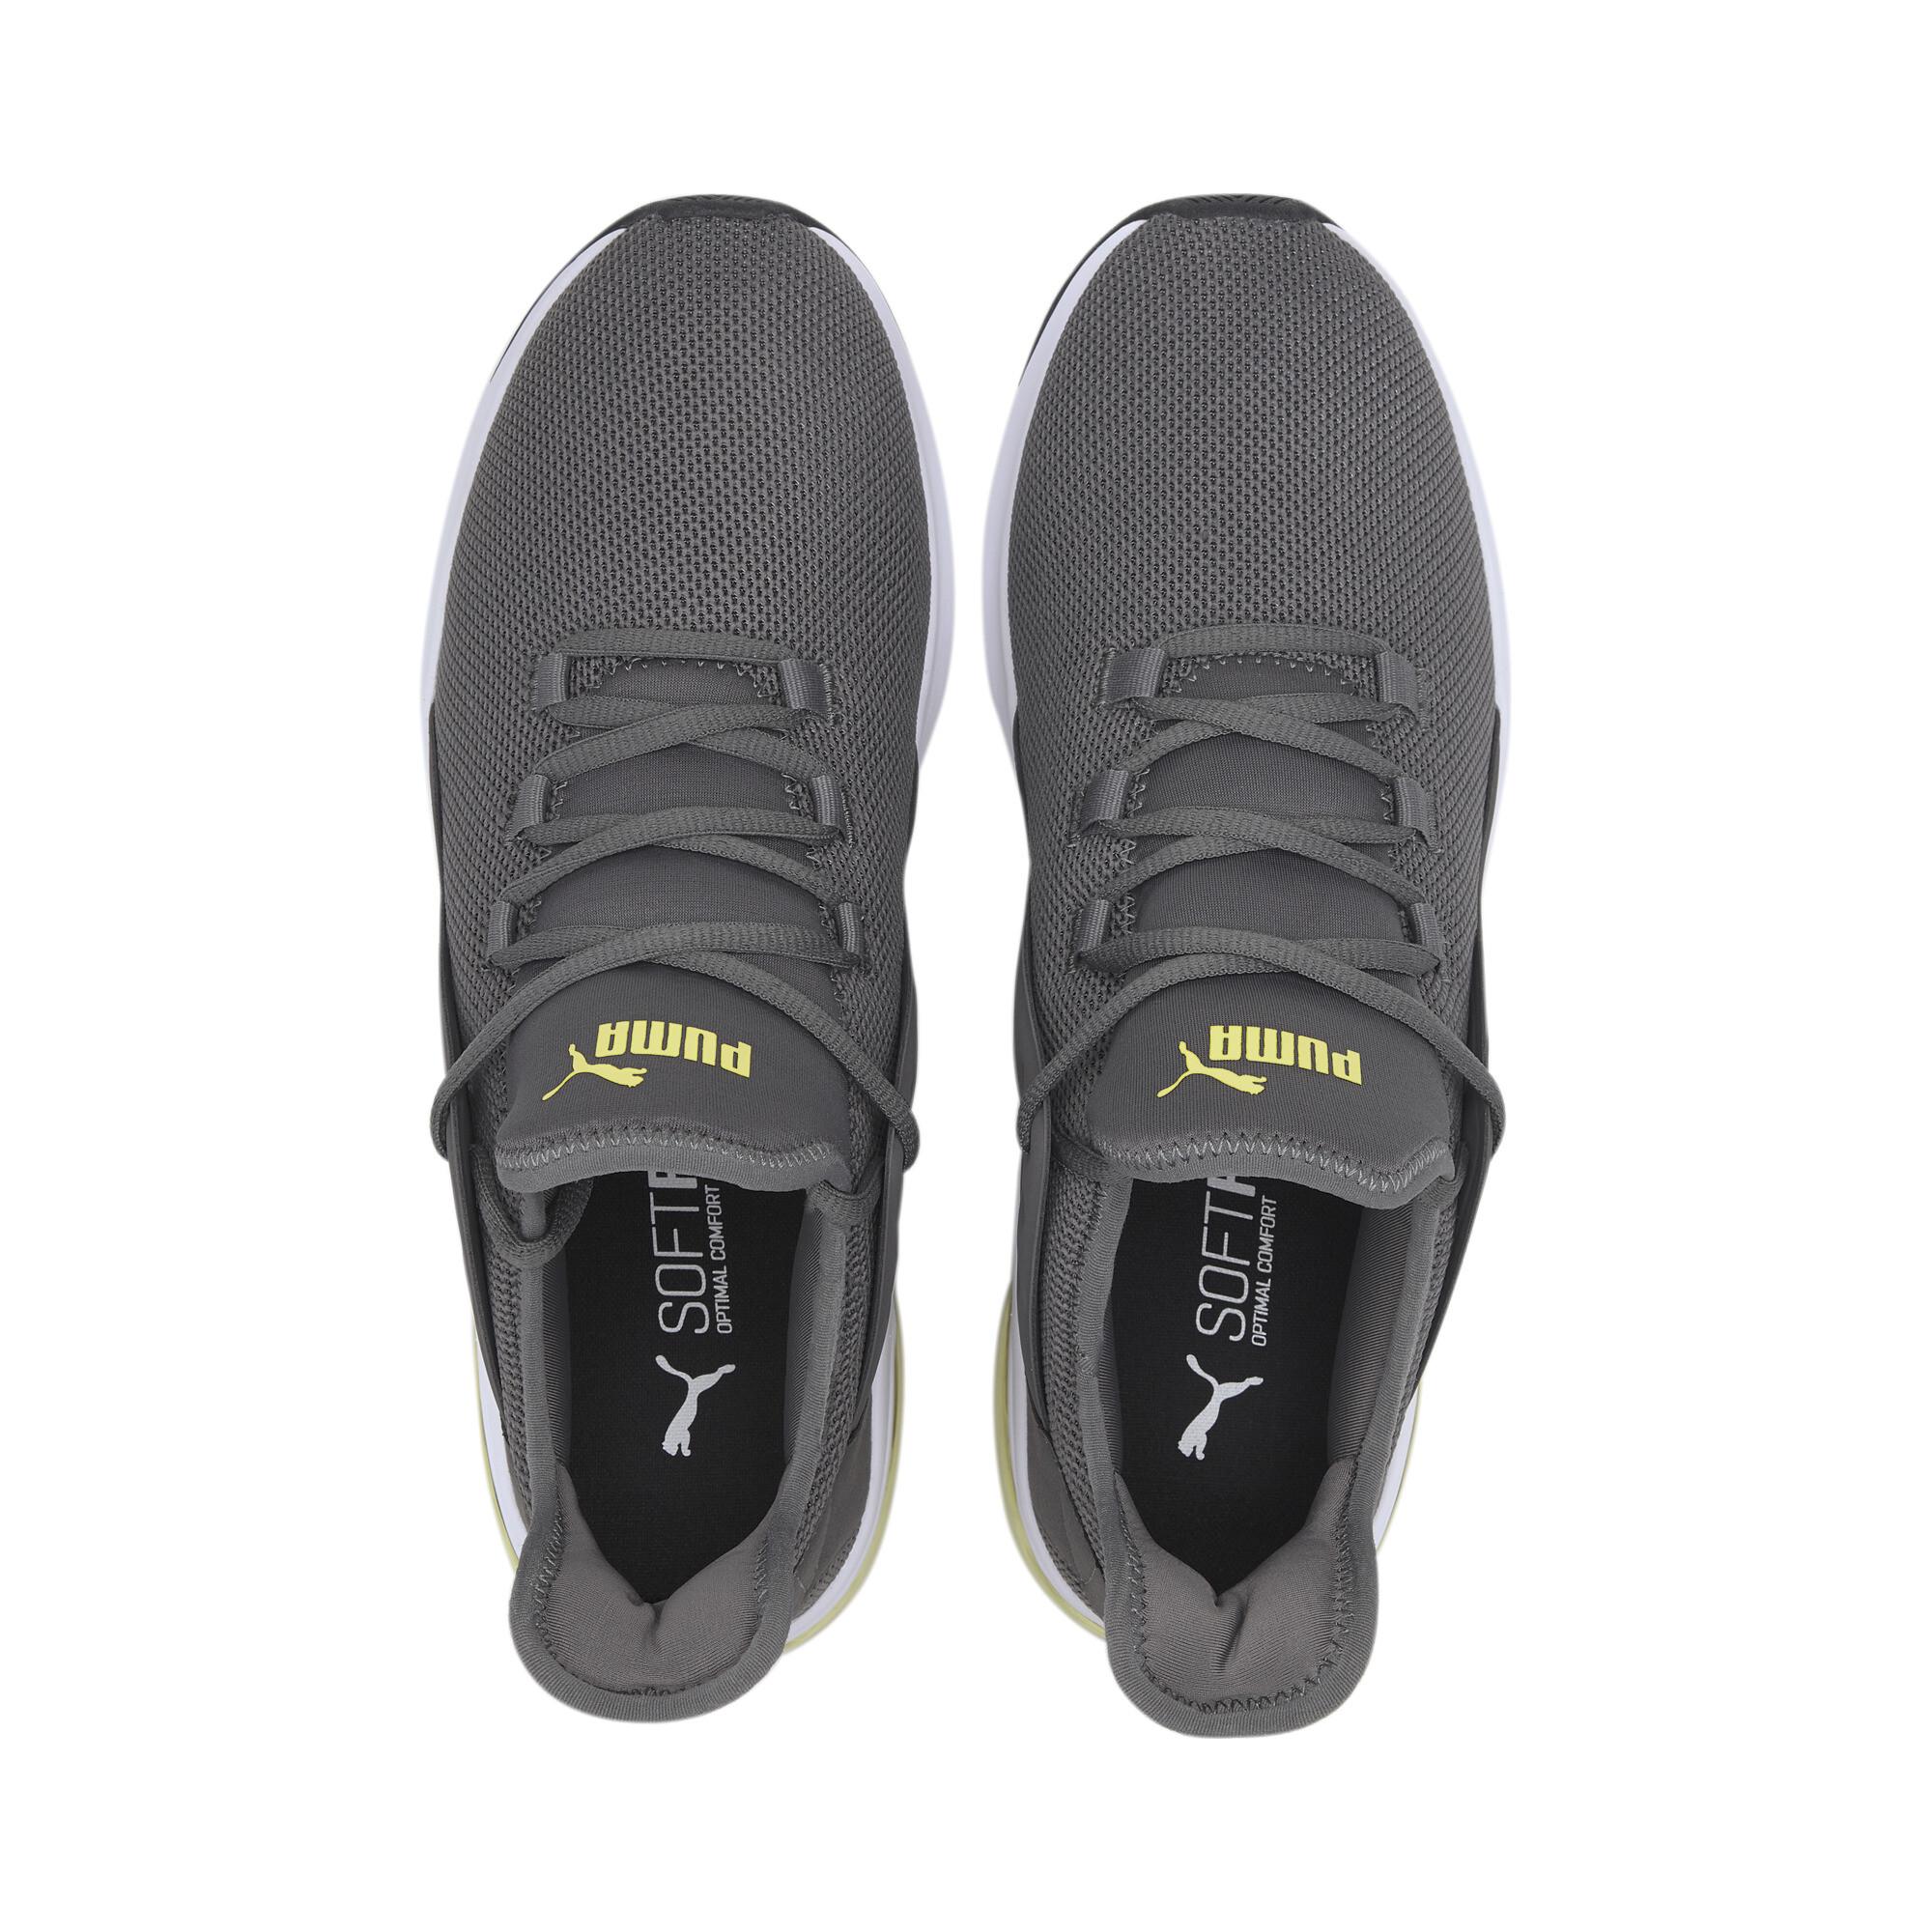 PUMA-Electron-Street-Men-039-s-Sneakers-Men-Shoe-Basics thumbnail 27